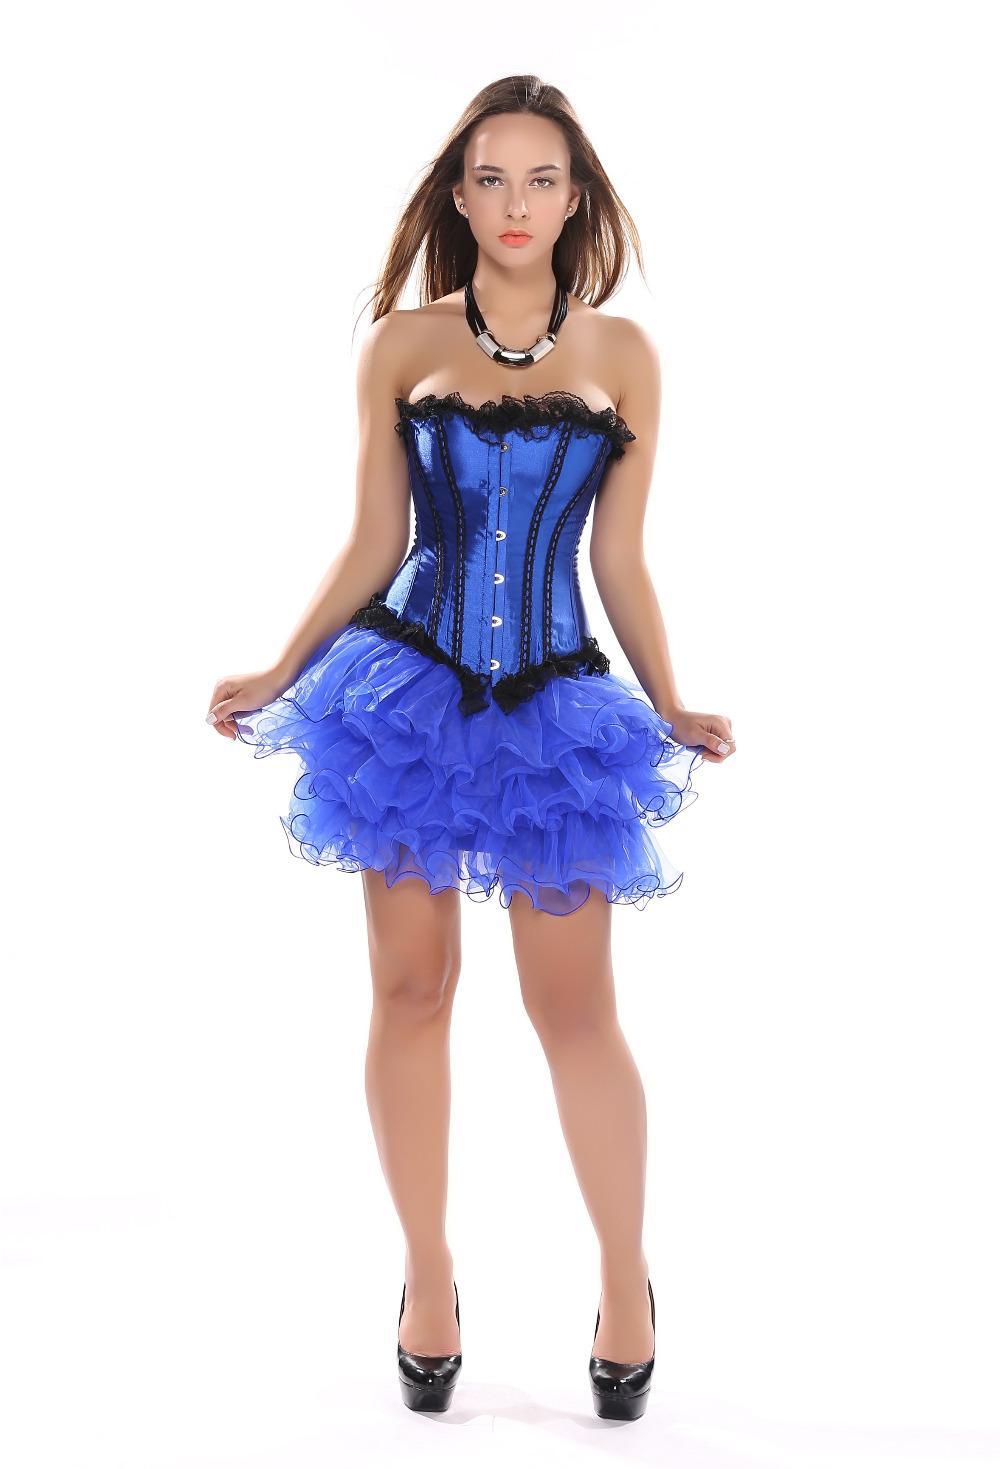 sext party club corset blue lace up boned lingerie and black lace tutu skirt showgirl dance dress body shaper bustier S-2XL